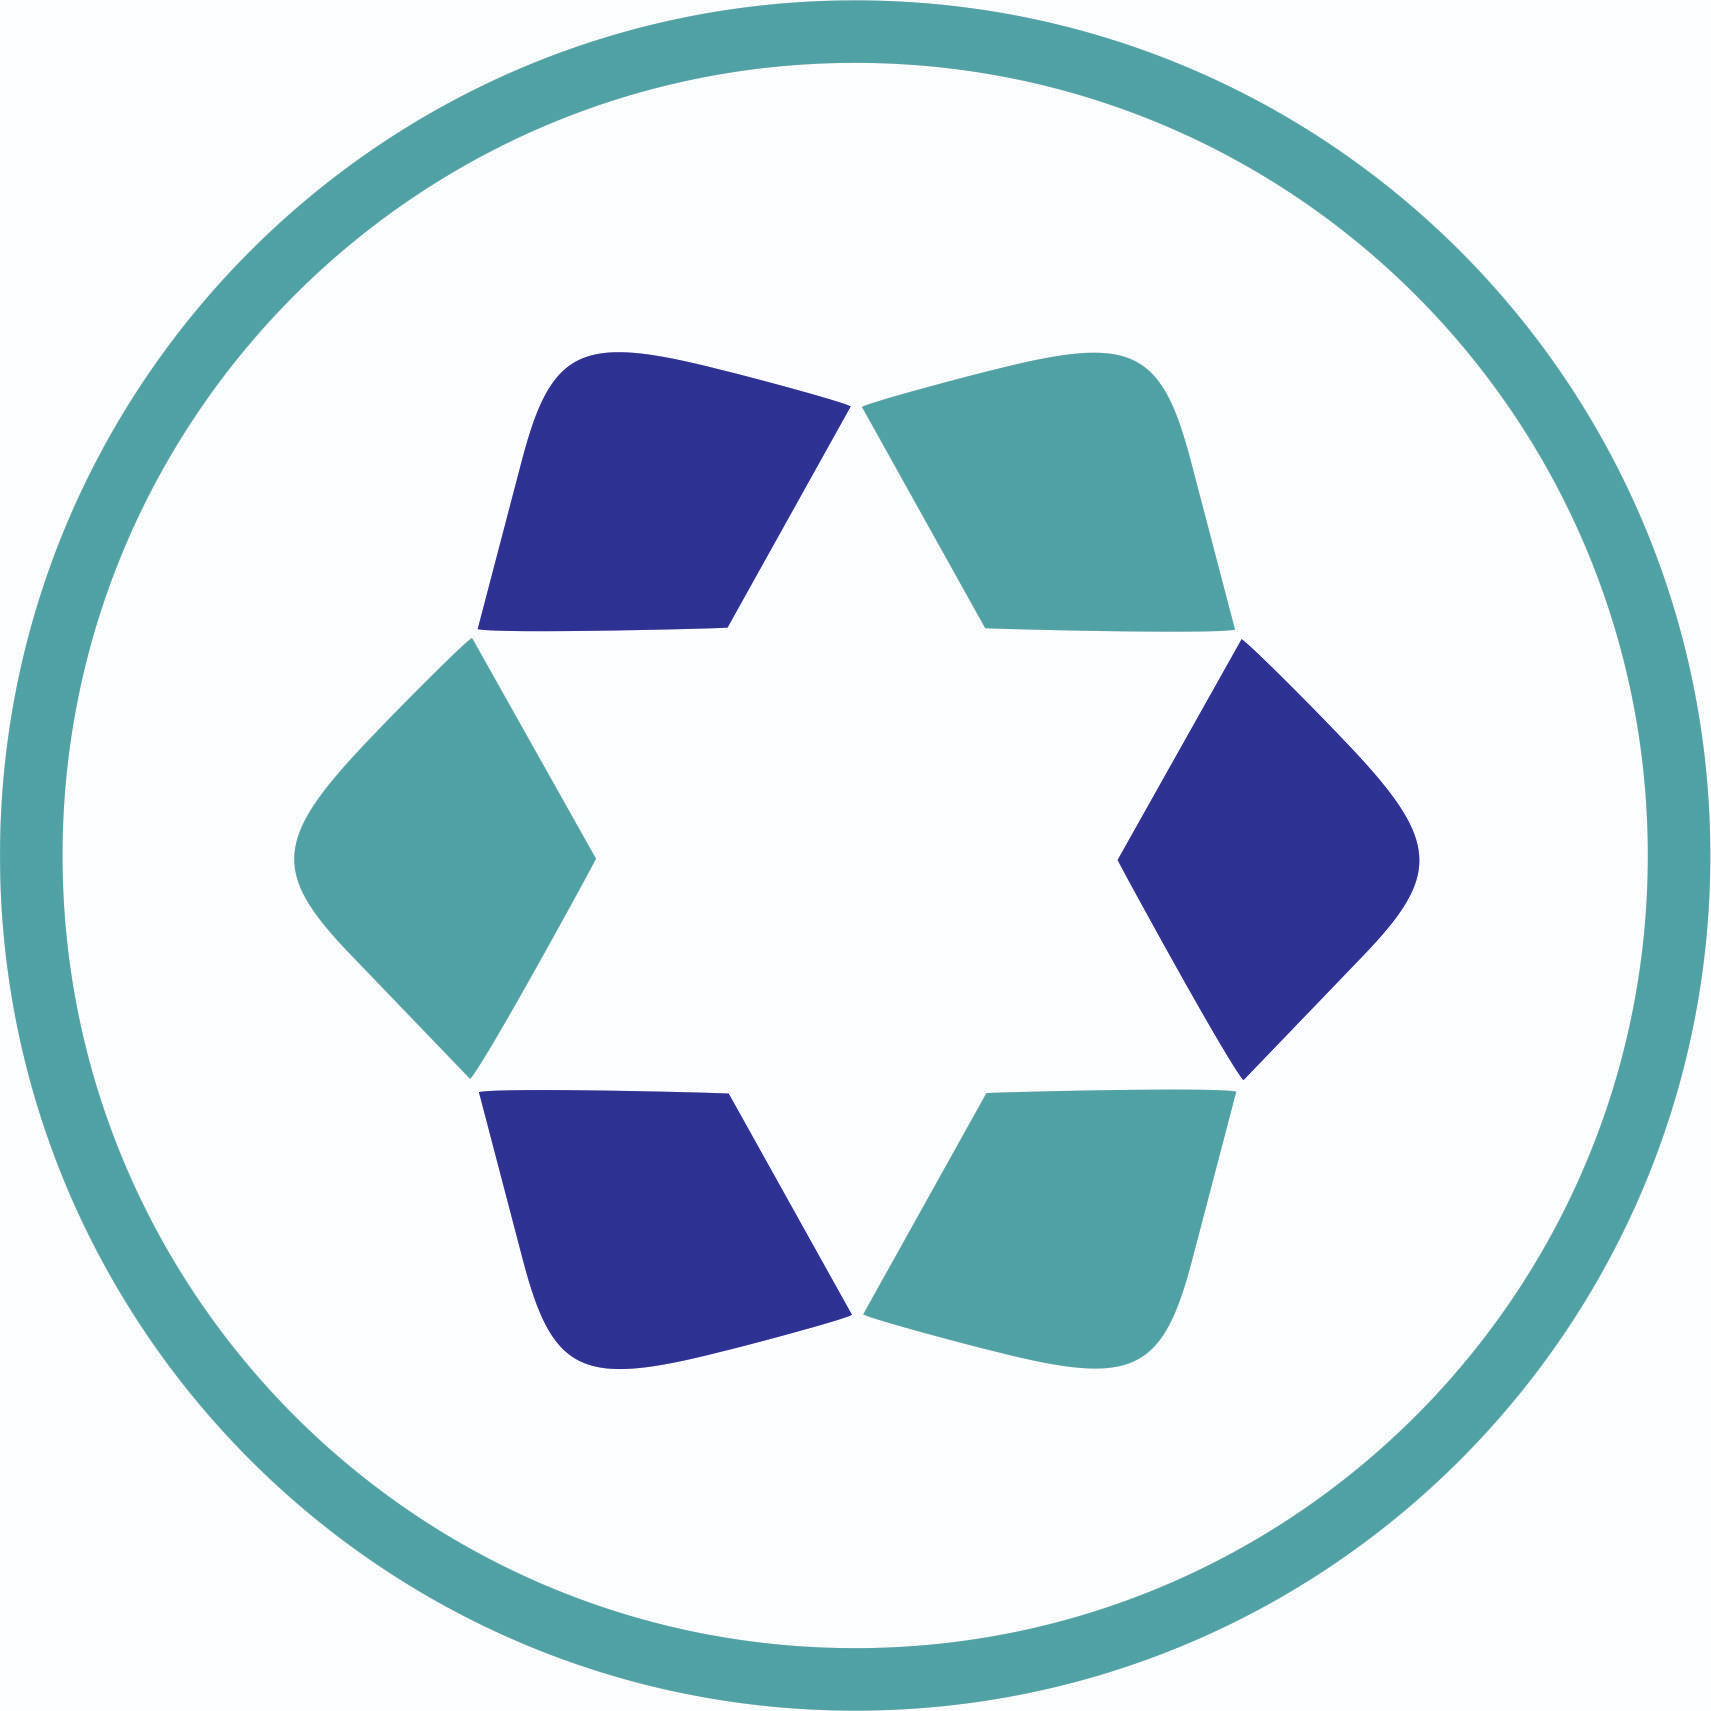 BEM ESTAR - Lar Israelita de Cuidado ao Idoso's Avatar